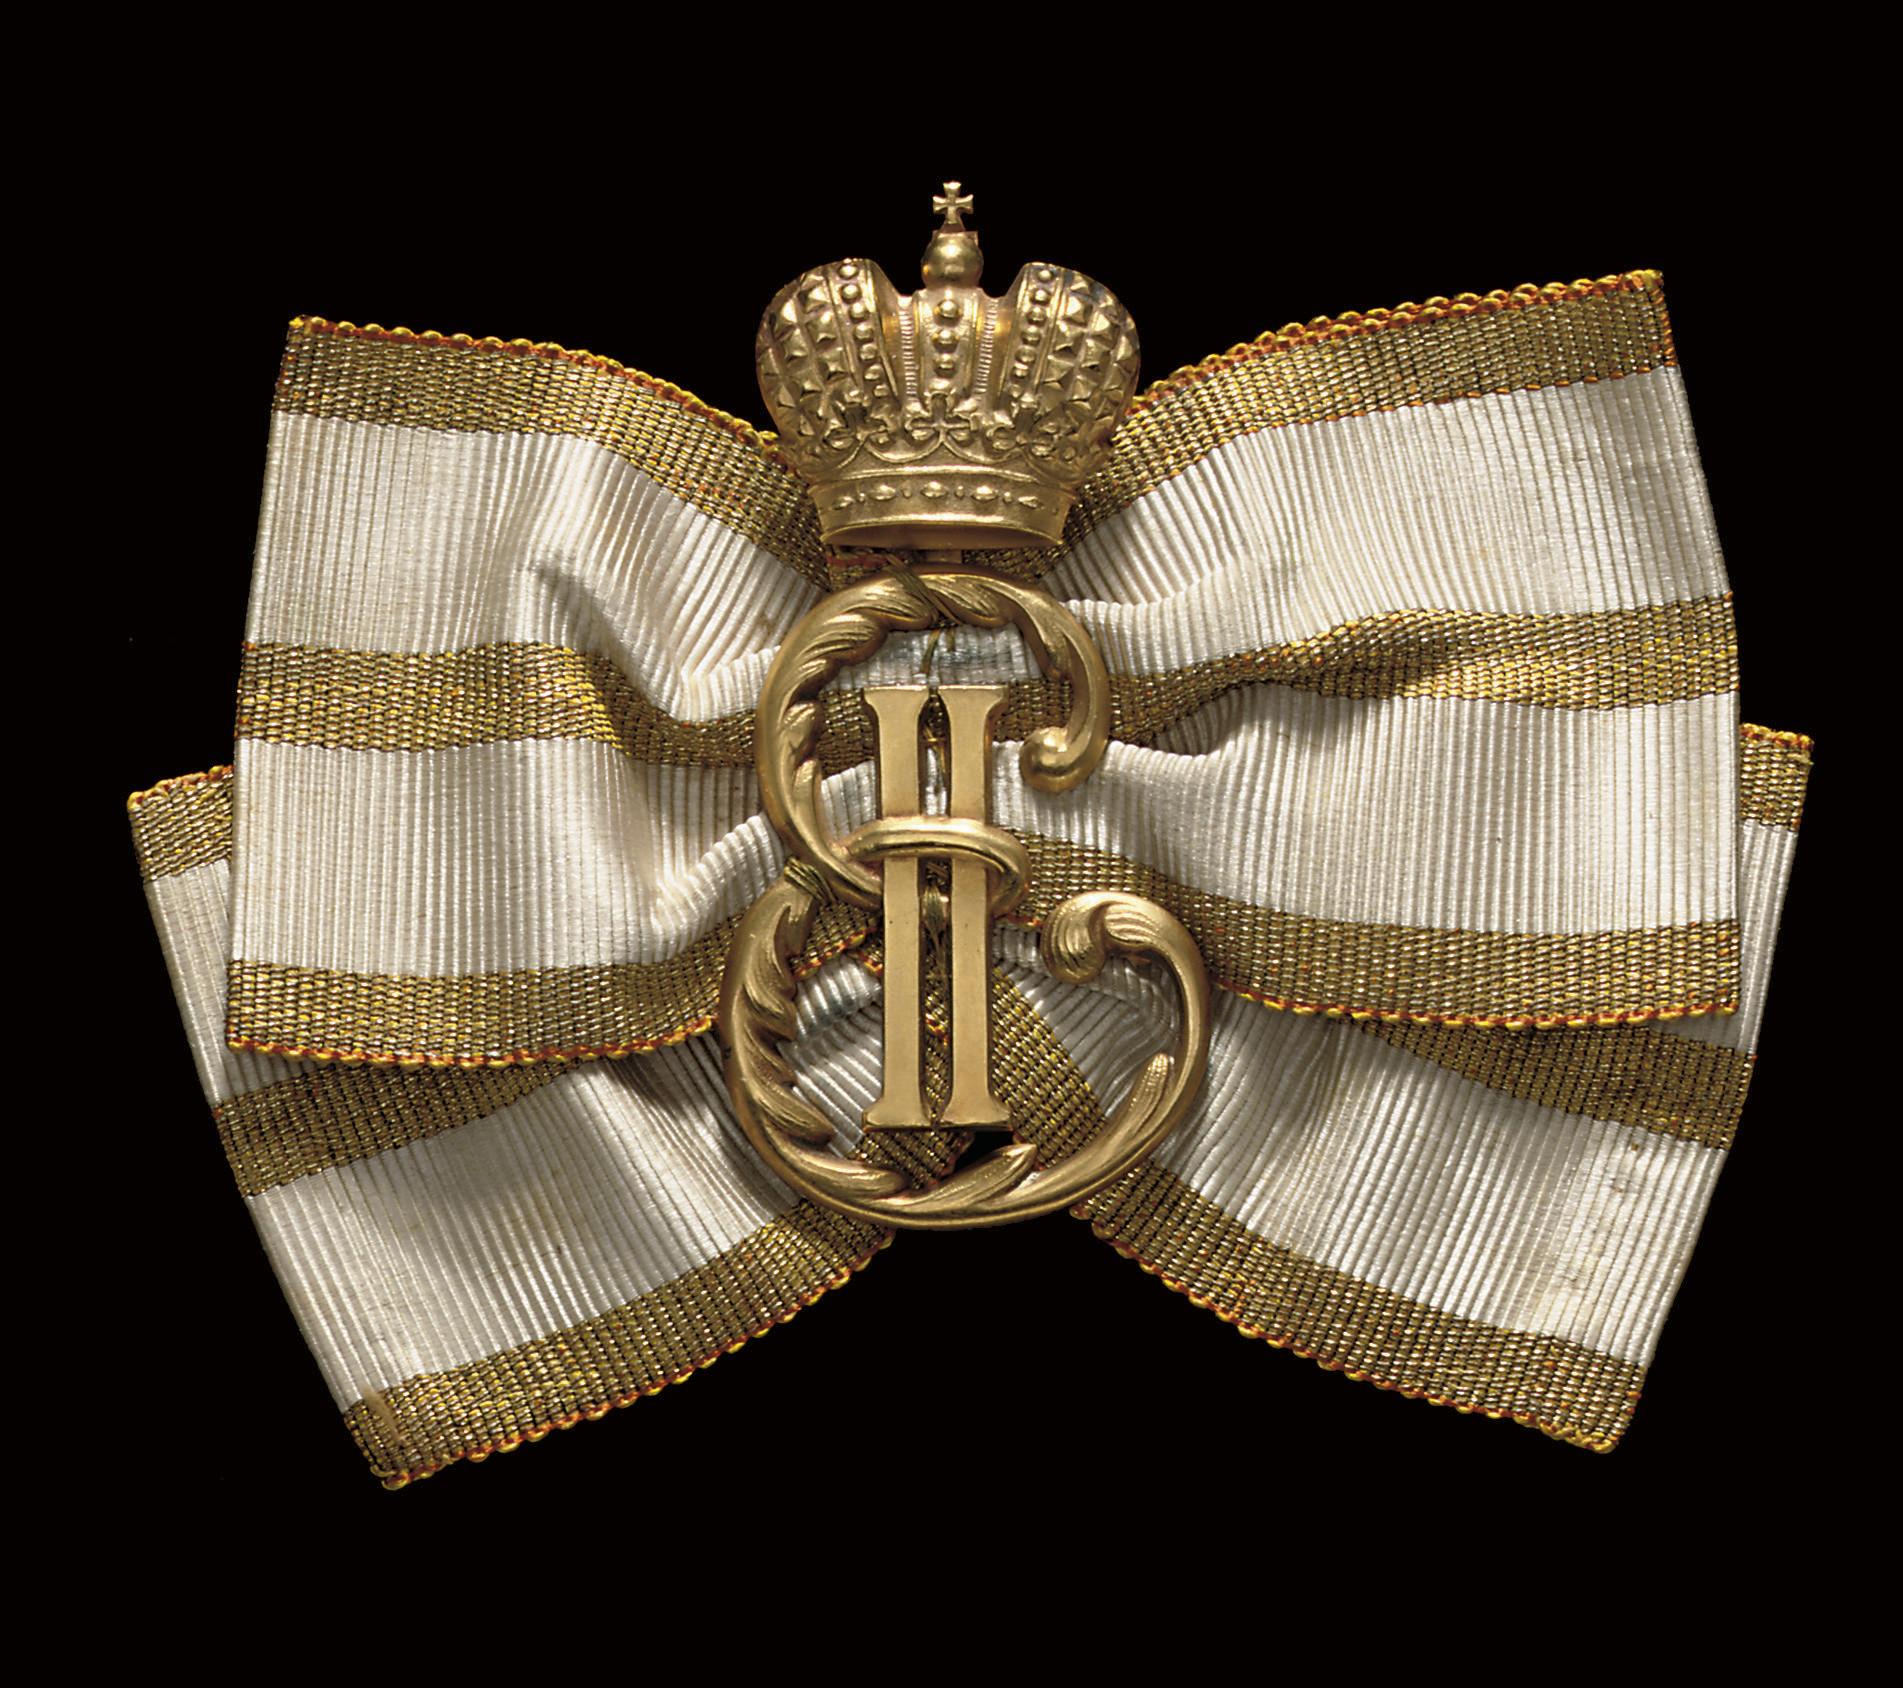 Gold monogram for rewarding pu